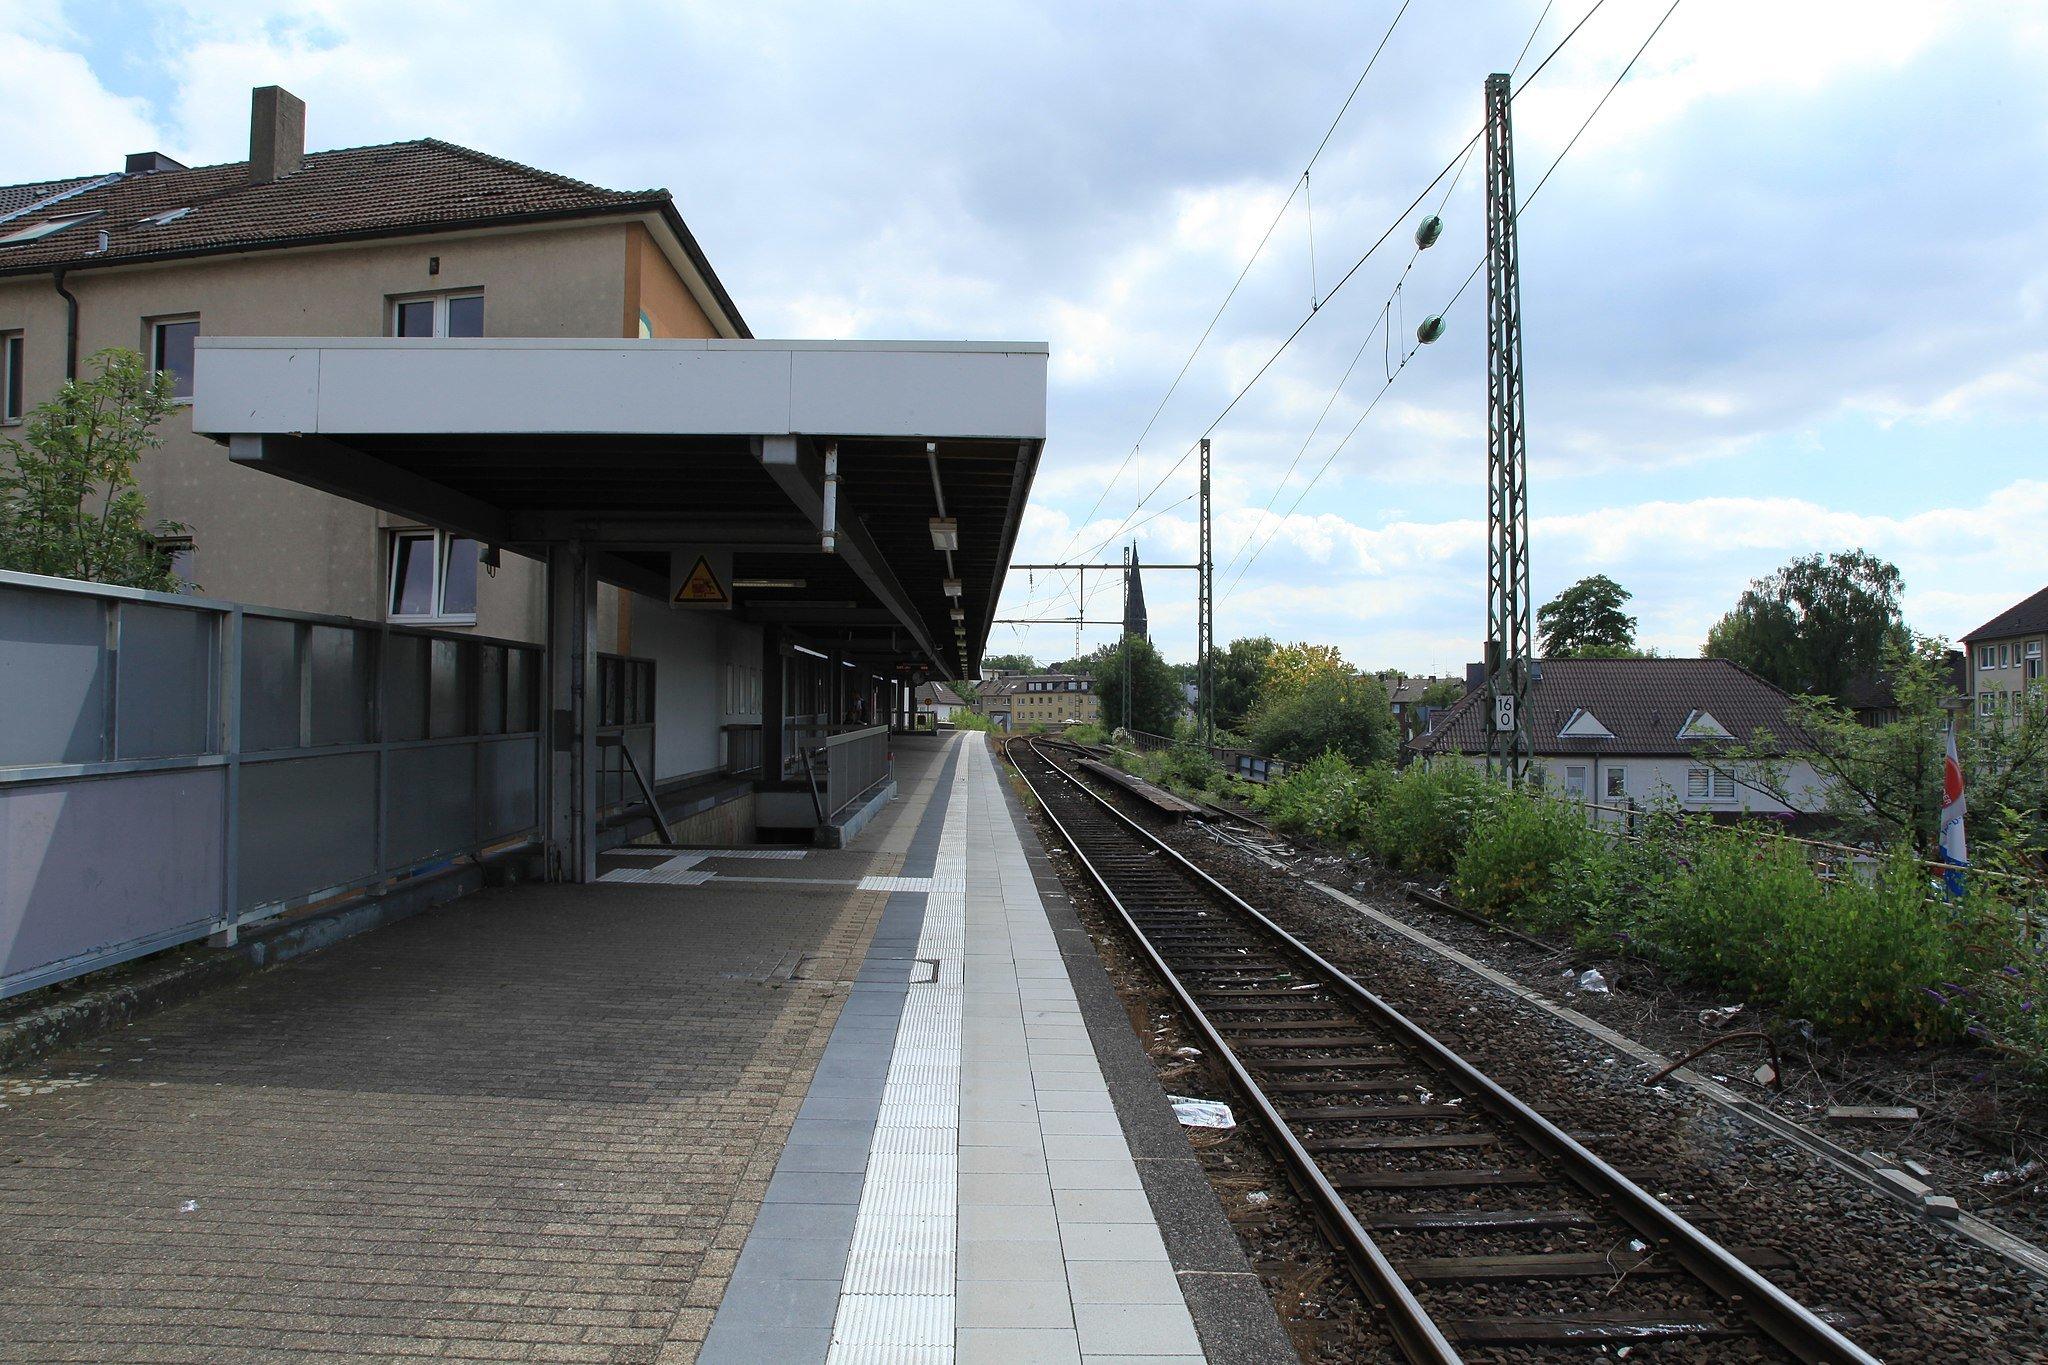 Vrr Bochum